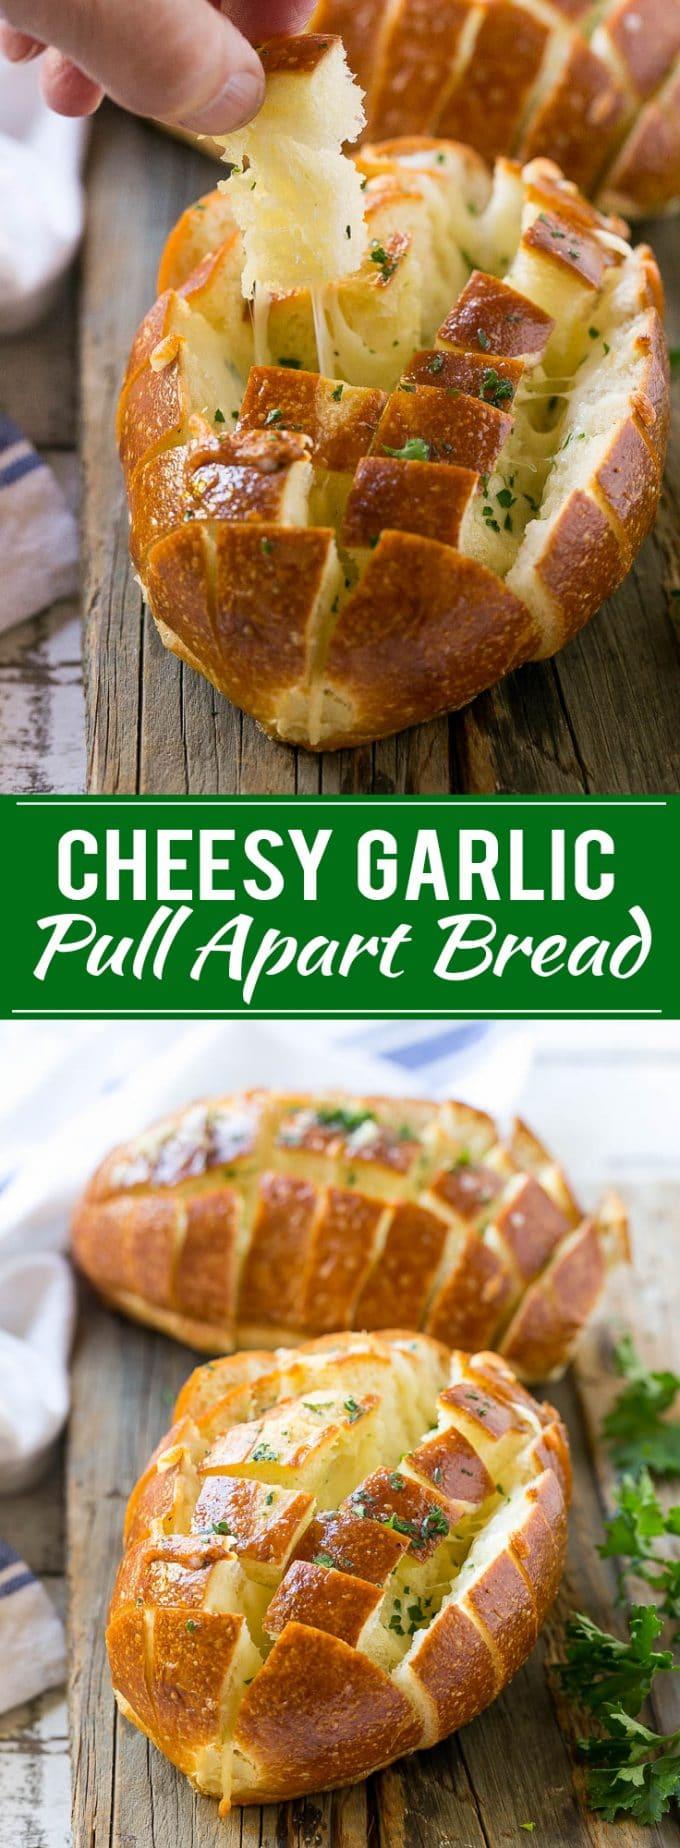 Cheesy Garlic Pull Apart Bread Recipe | Pull Apart Bread | Garlic Bread | Cheesy Bread | Easy Side Dish